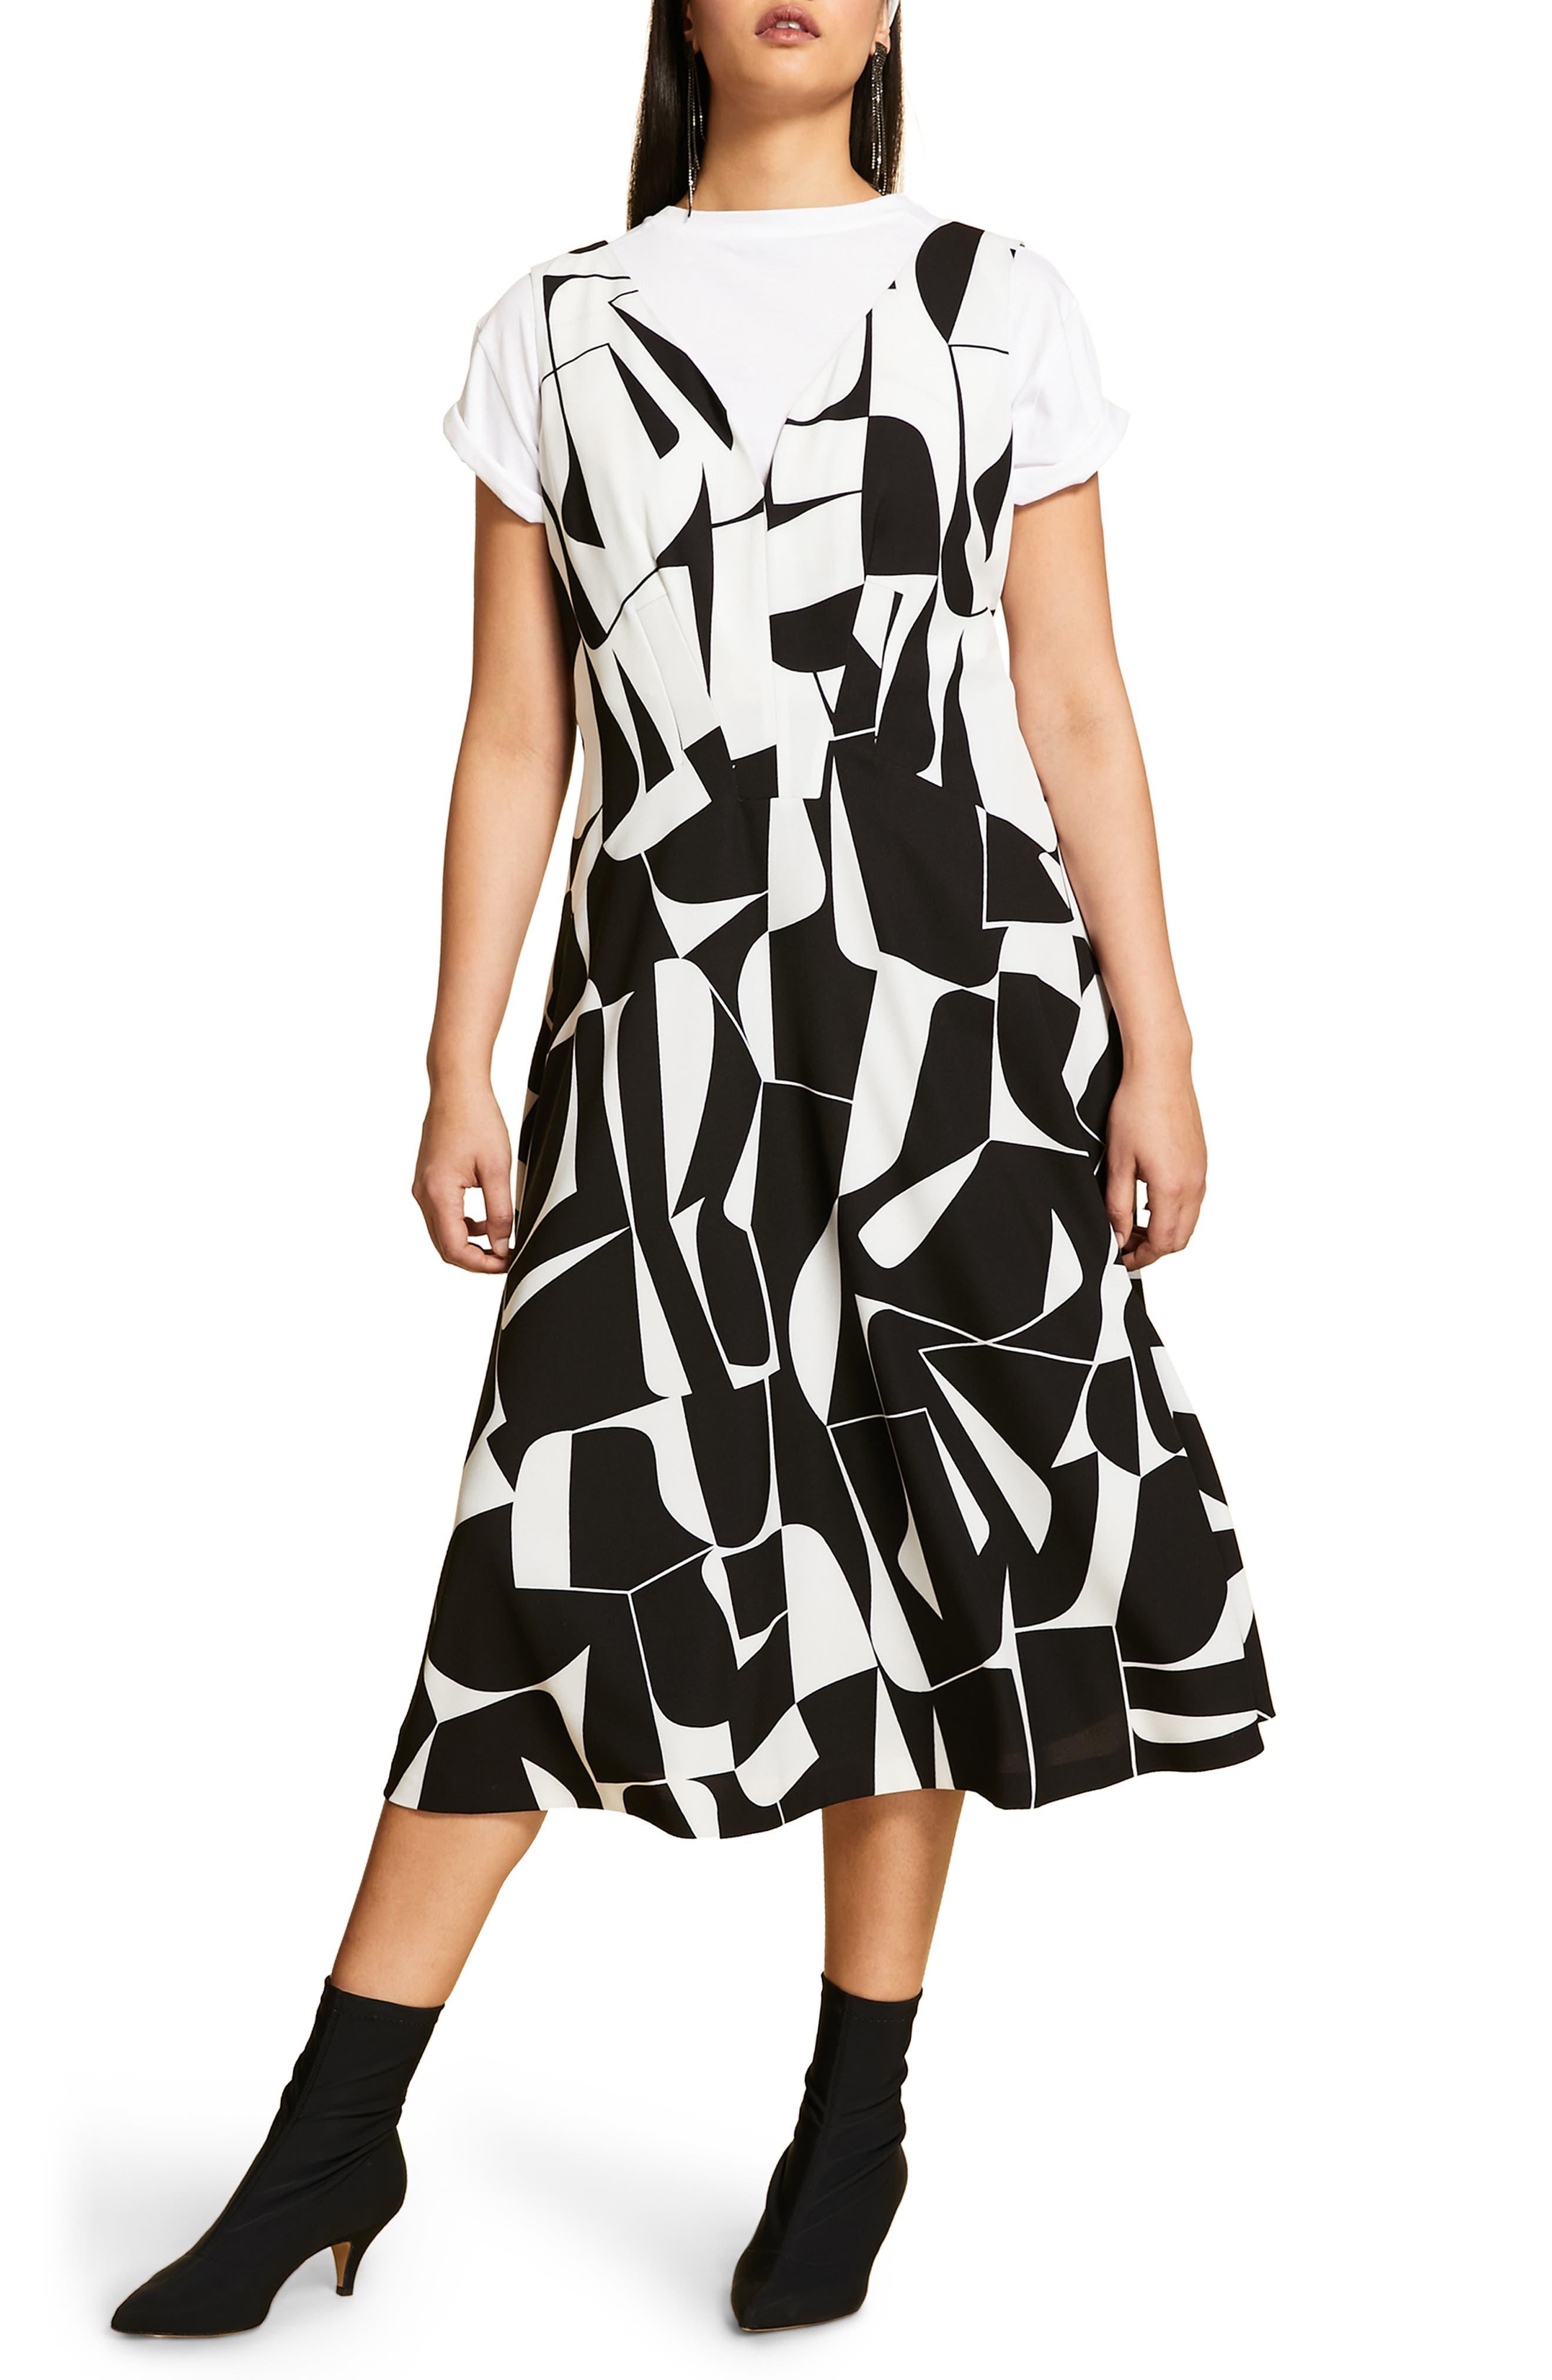 Plus Size Marina Rinaldi Dalia Graphic Print Cady Dress, Black